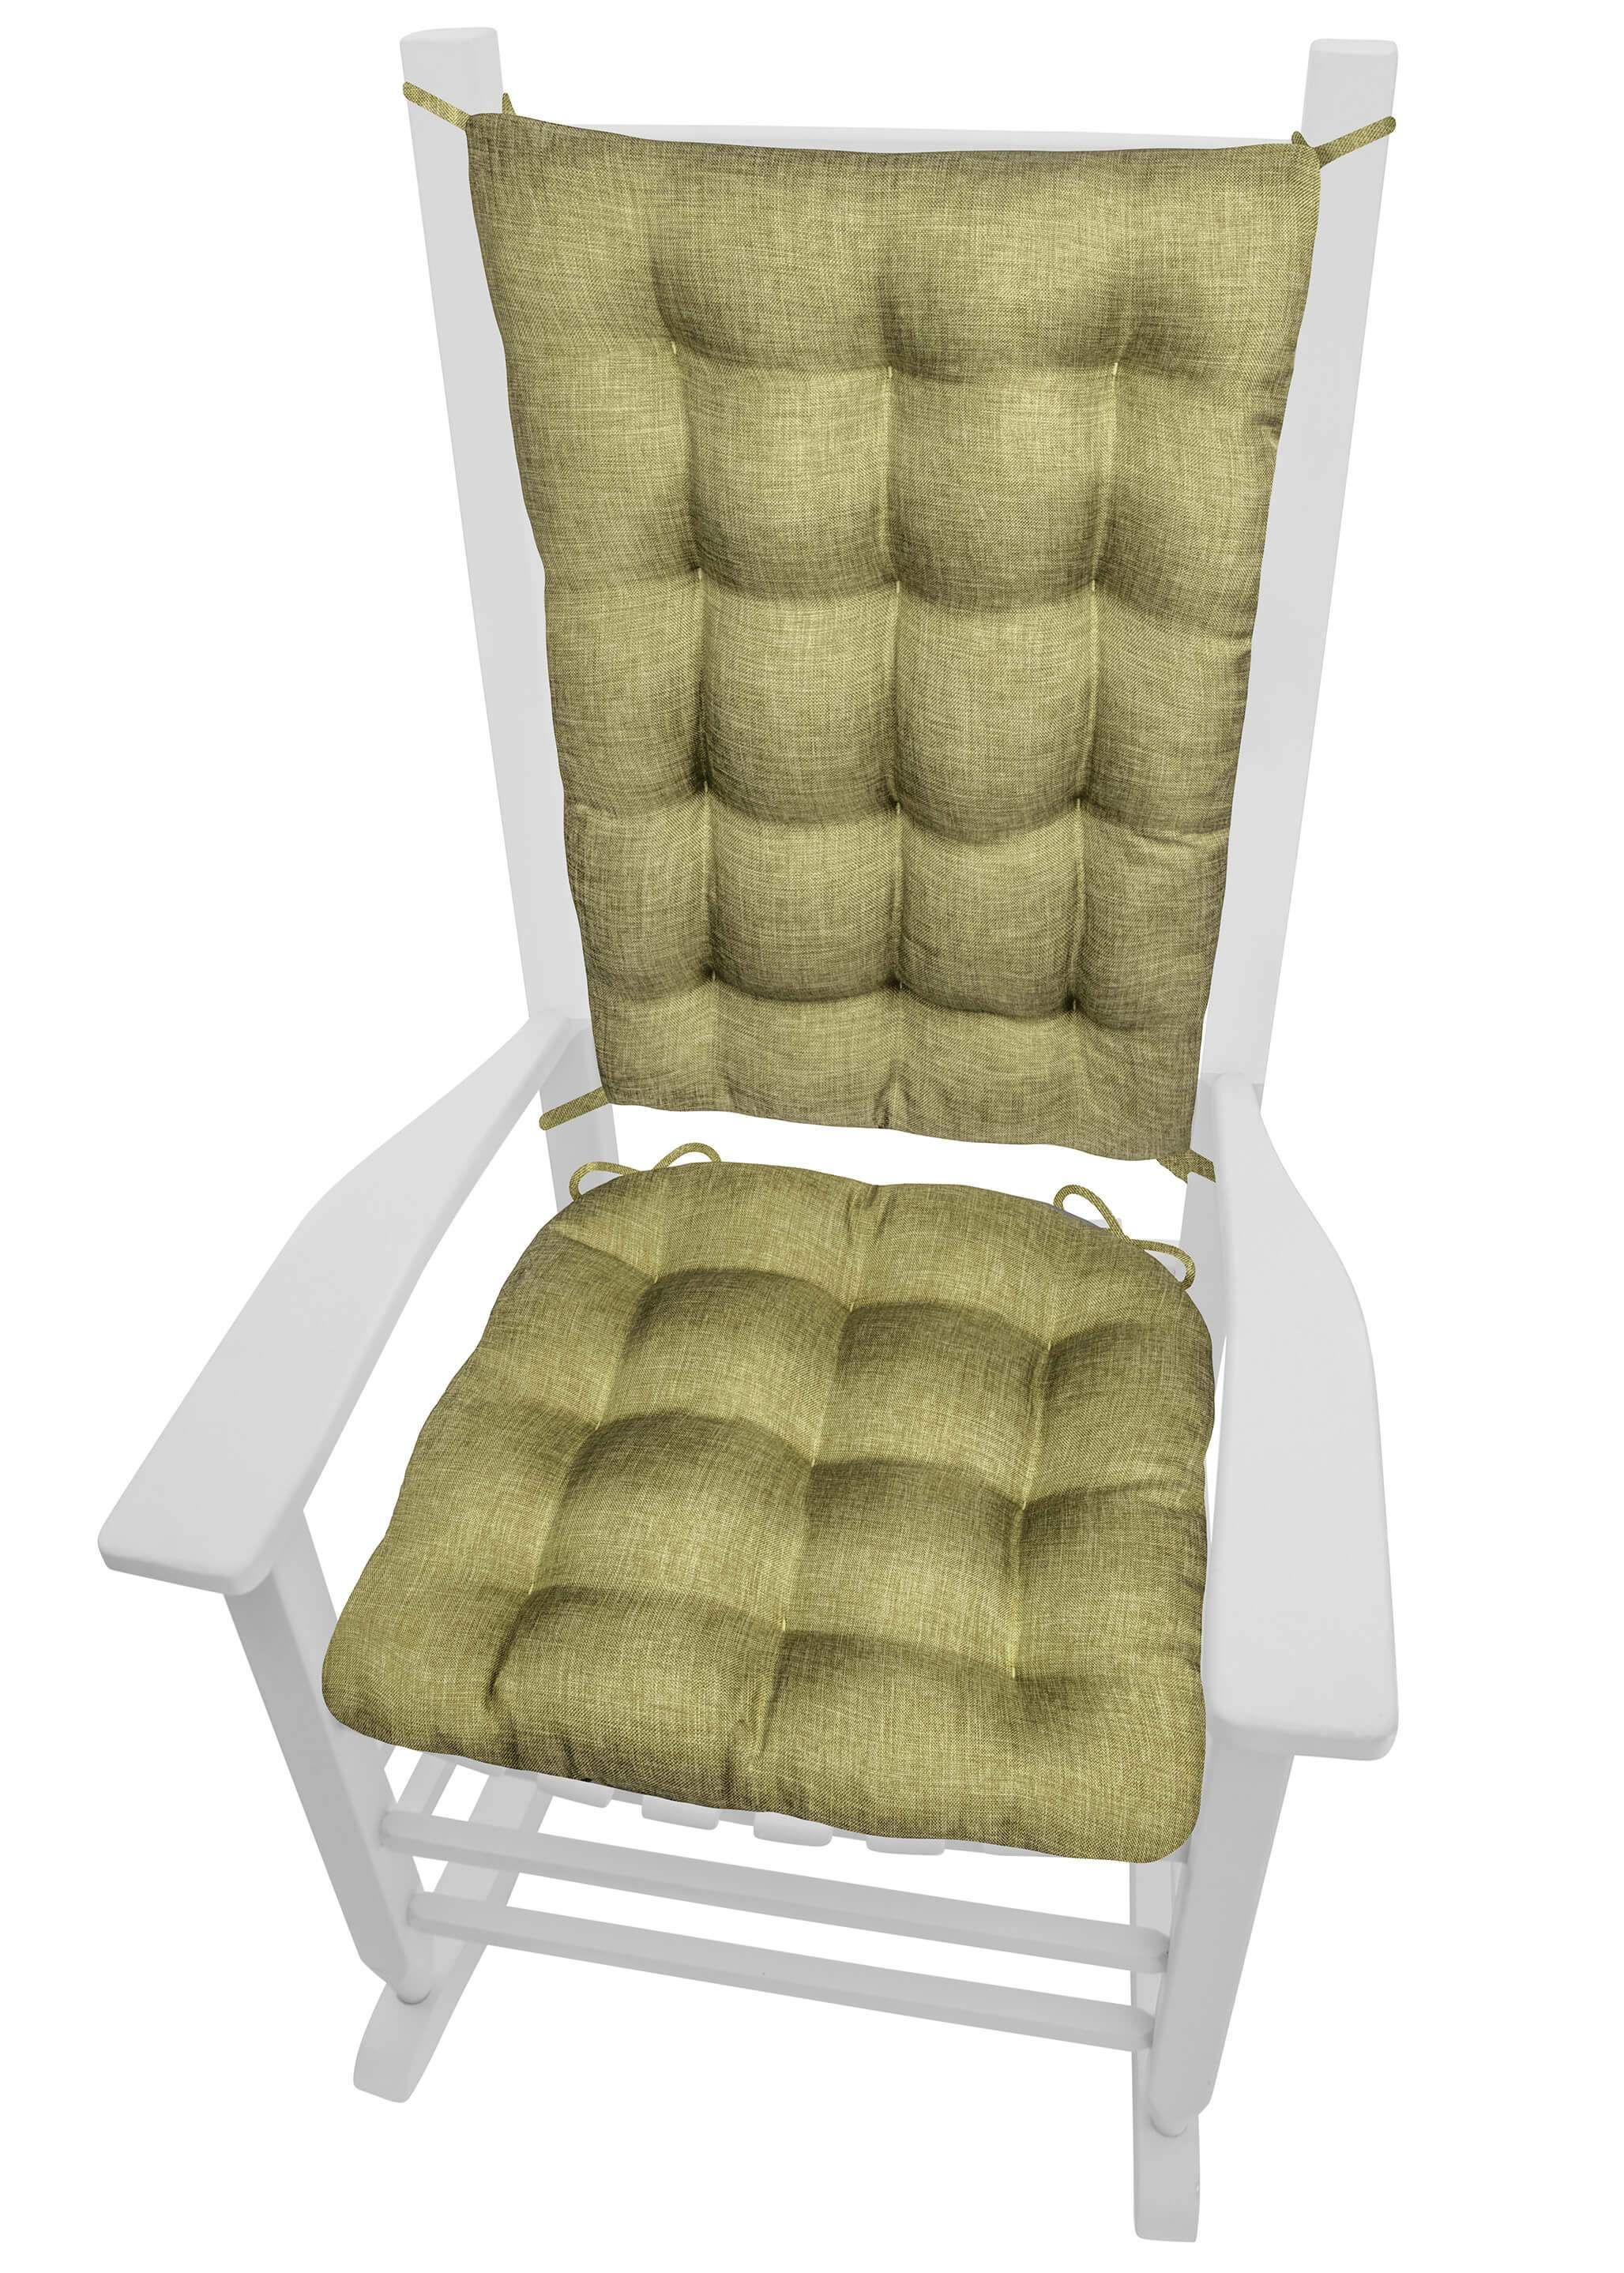 Hayden Meadow Green Rocking Chair Cushions Barnett Home Decor Blackfriday Homedecor Rockingchair